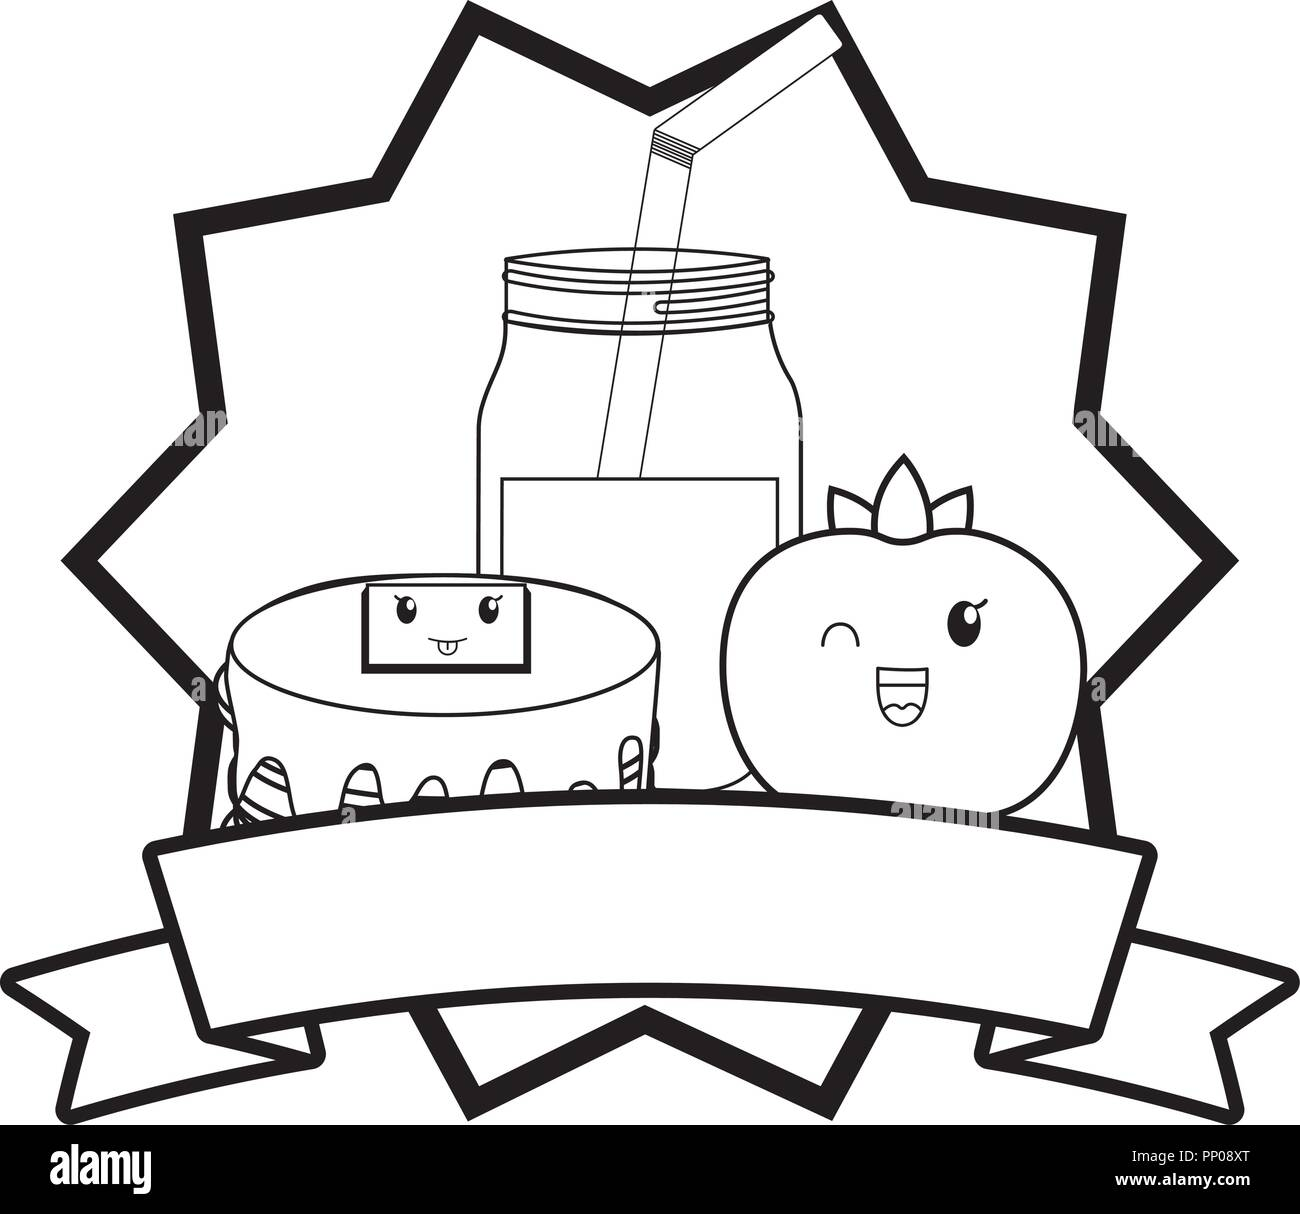 emblem kawaii pancakes and orange juice over white background, vector illustration - Stock Image